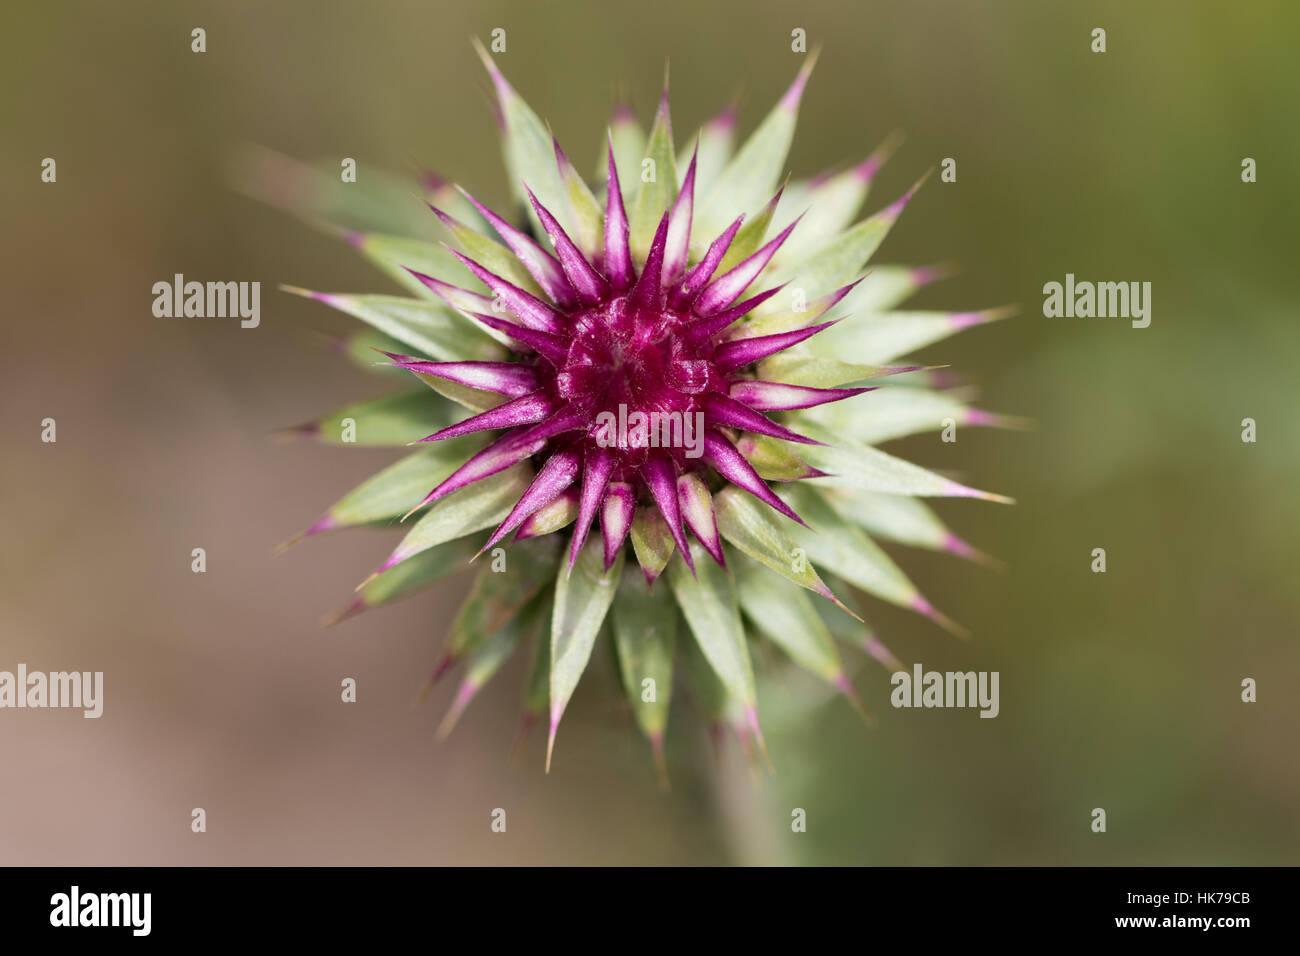 unopened Musk Thistle (Carduus nutans) flower - Stock Image